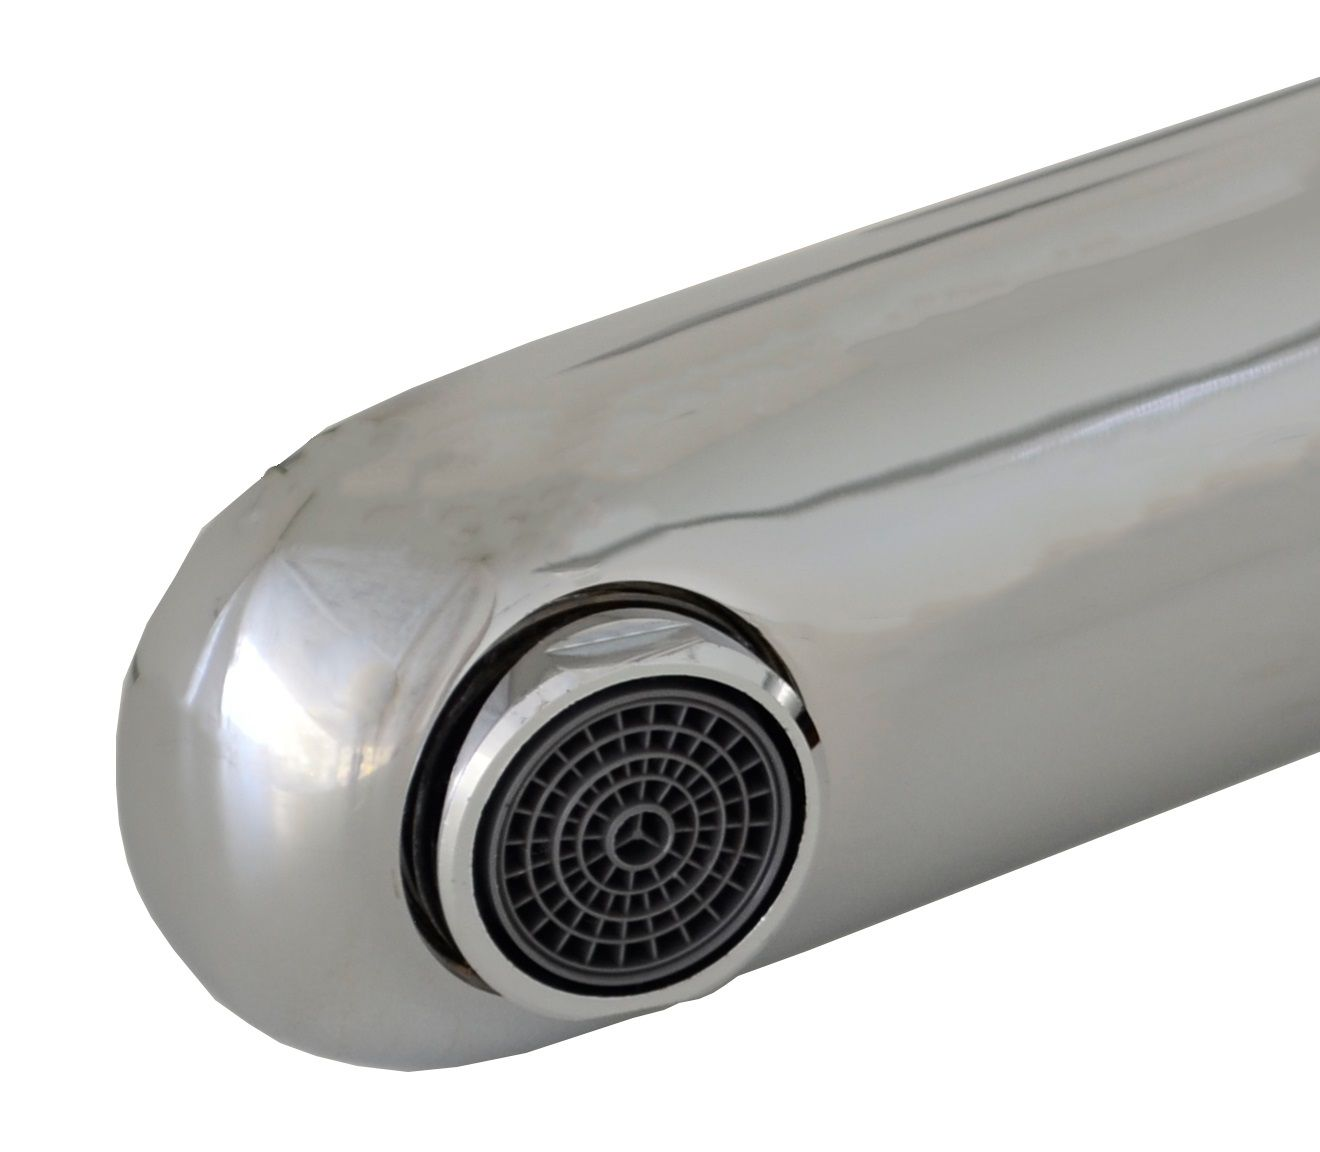 Torneira Monocomando Banheiro Baixa Metal Cromado Pd 1117